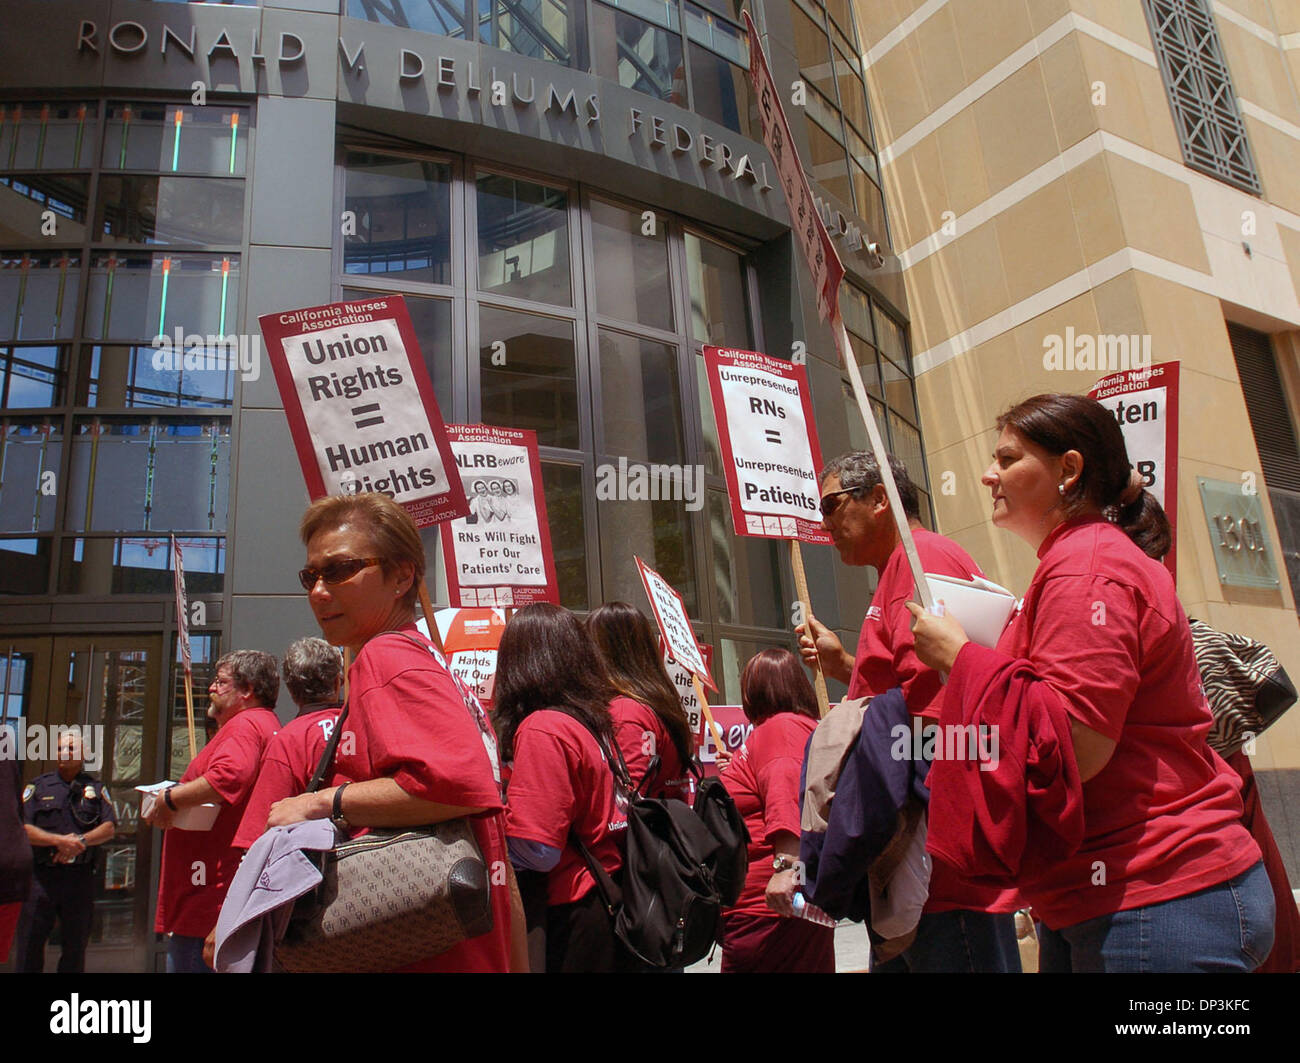 Jul 11, 2006; Oakland, CA, USA; Nurses march outside the Ronald Dellums Federal Building for the California Nurses - Stock Image